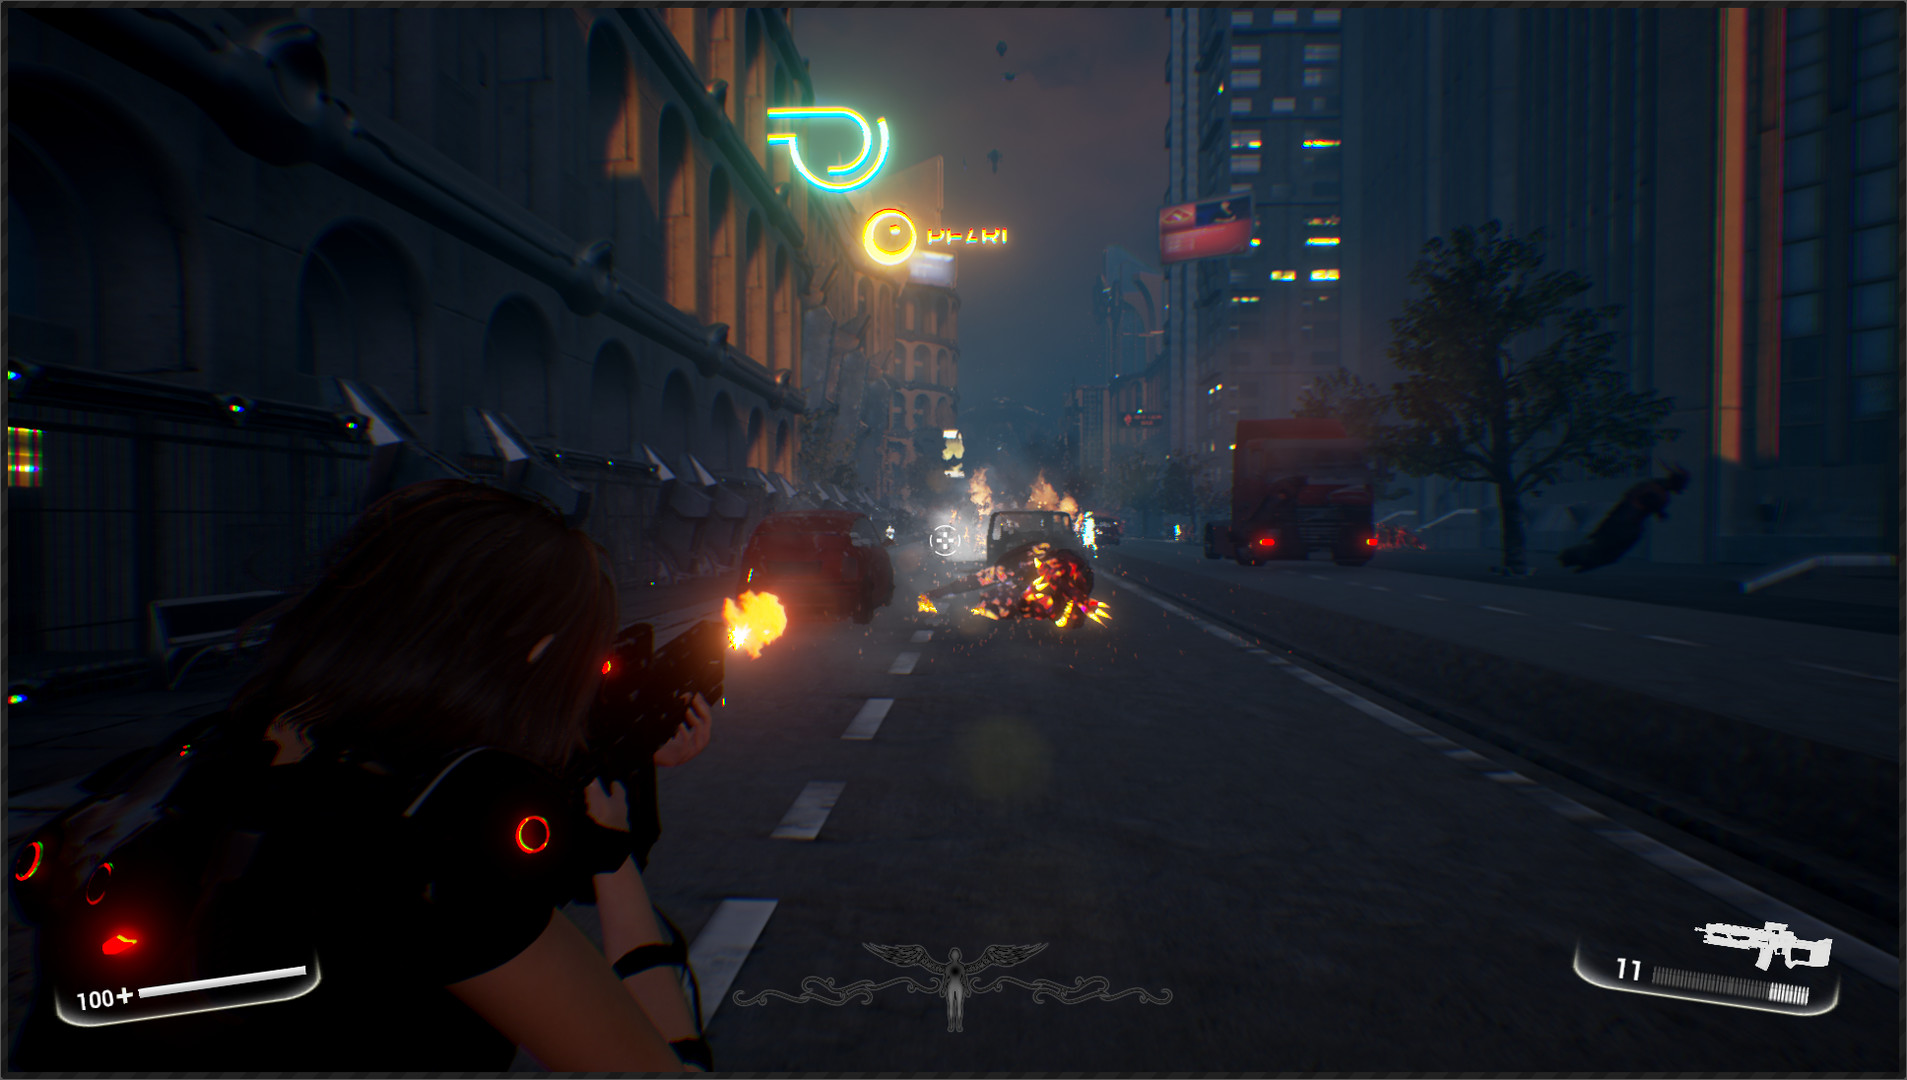 Save Our Souls Screenshot 1